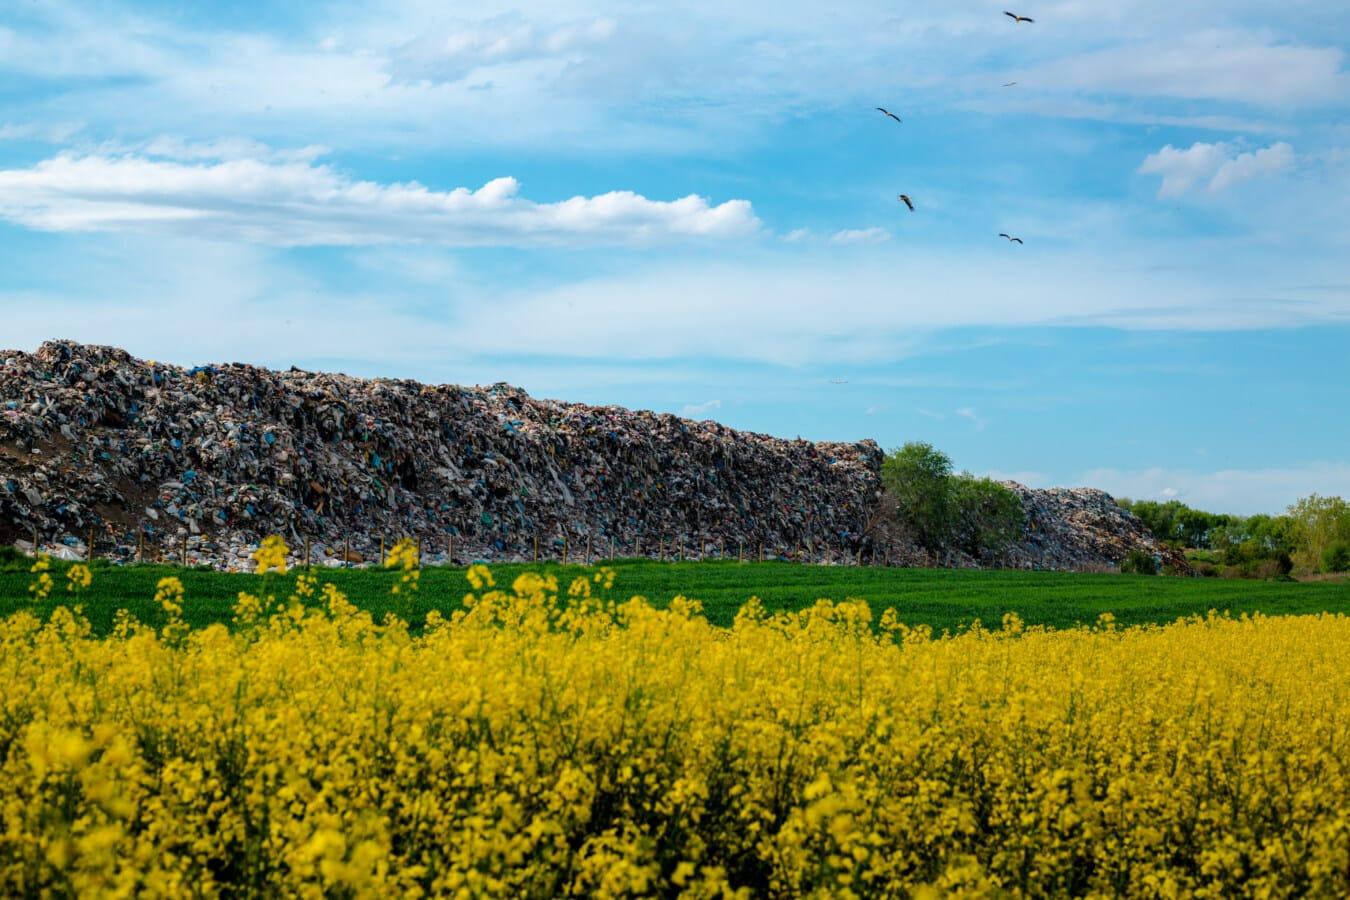 junkyard, garbage, garbage collection, junk, agricultural, field, rapeseed, landscape, nature, flower